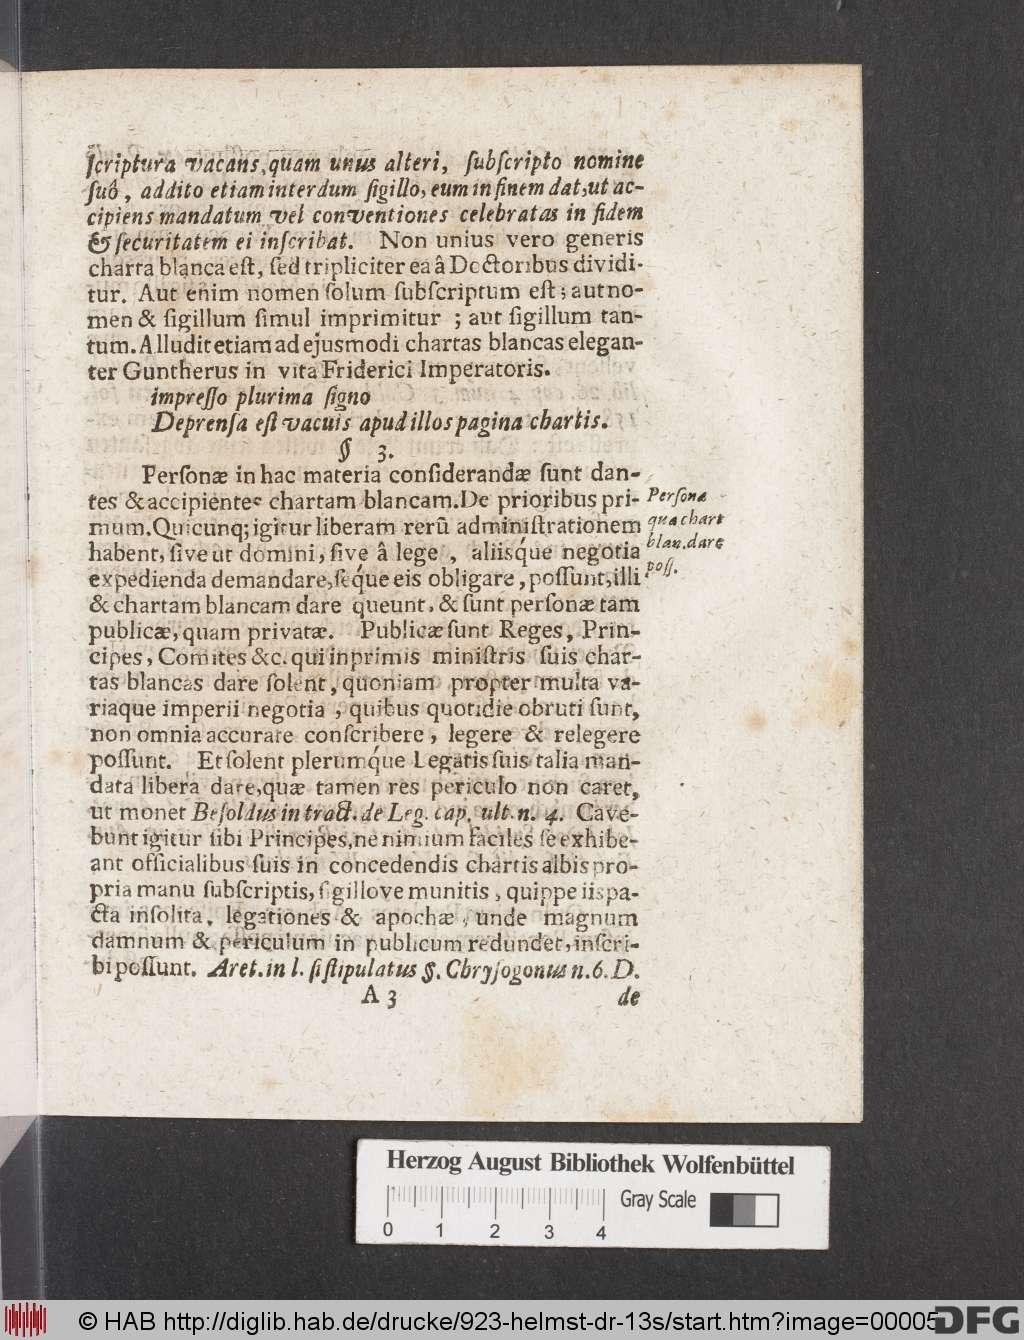 https://diglib.hab.de/drucke/923-helmst-dr-13s/00005.jpg